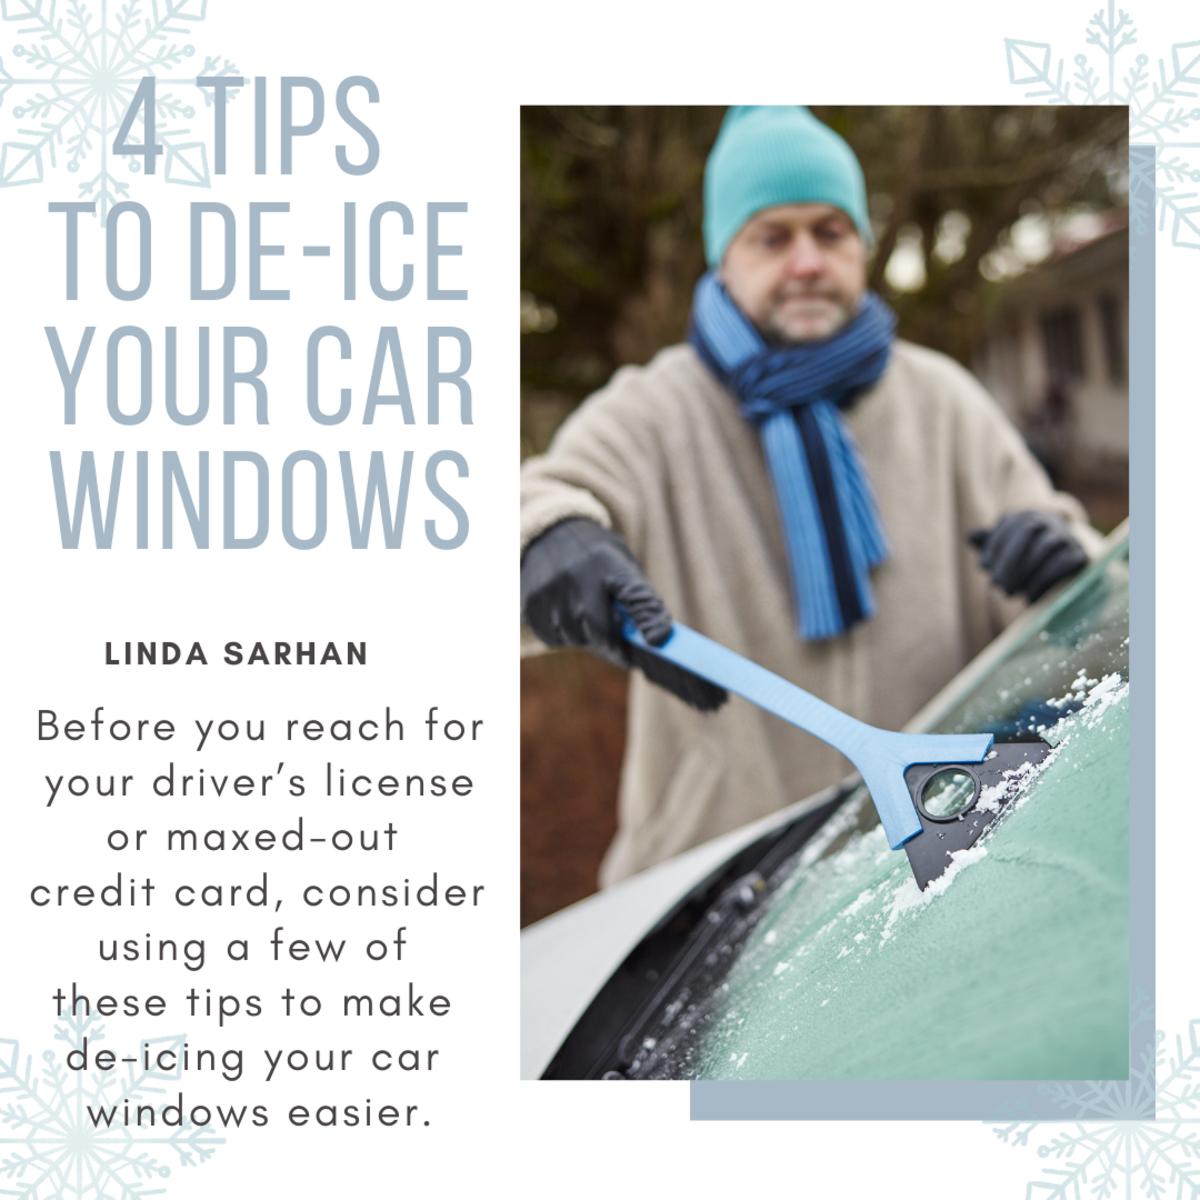 4 Tips to Help De-ice Your Car Windows